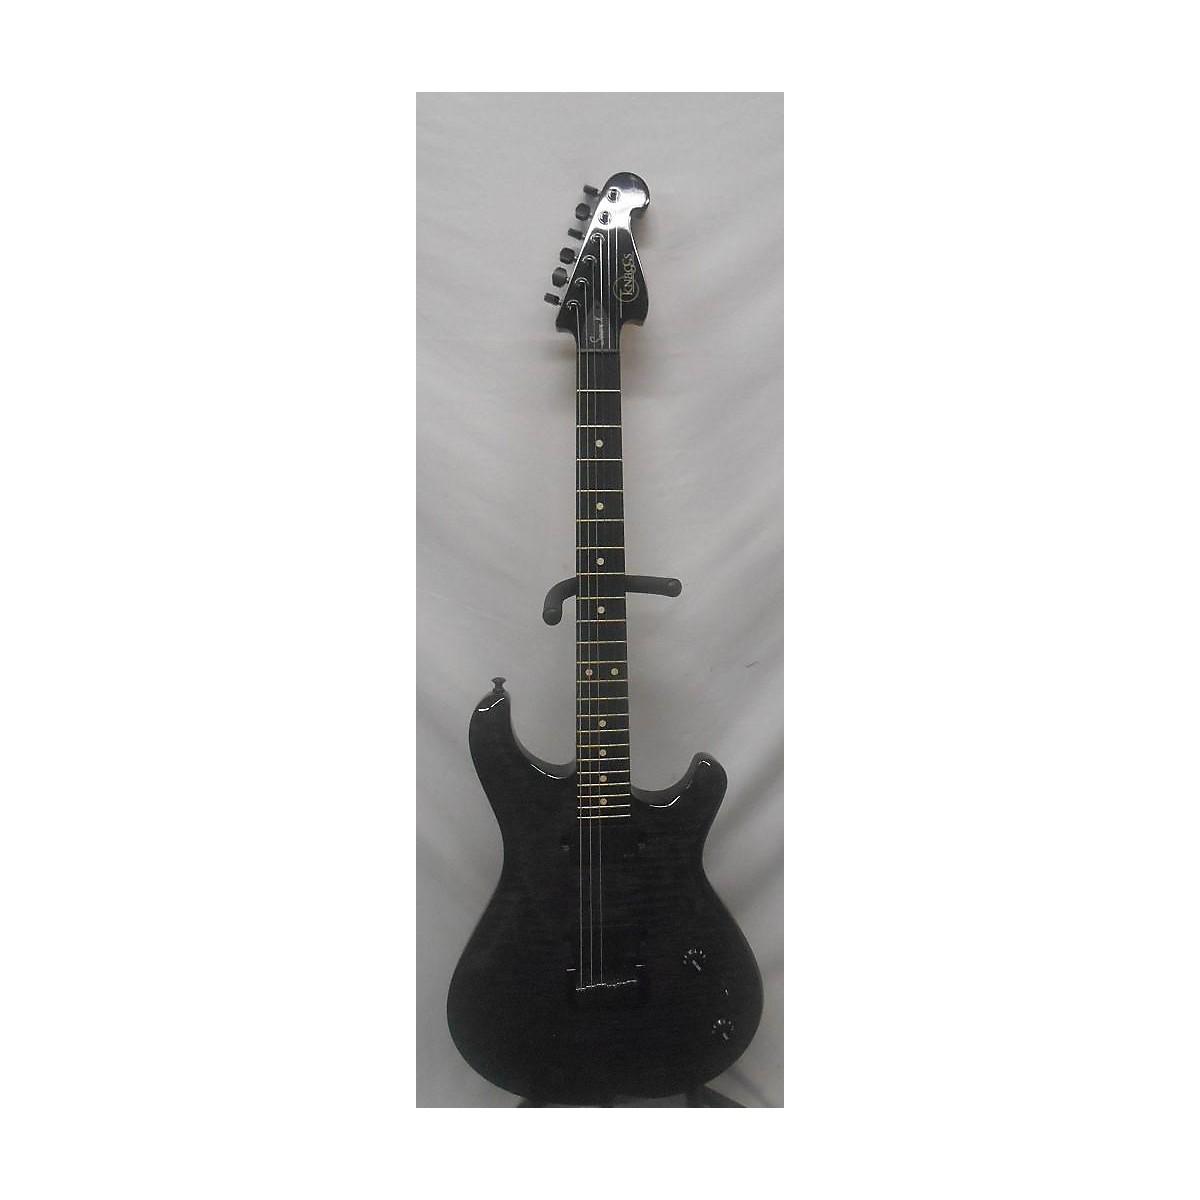 Knaggs Severn X Trembuck Solid Body Electric Guitar